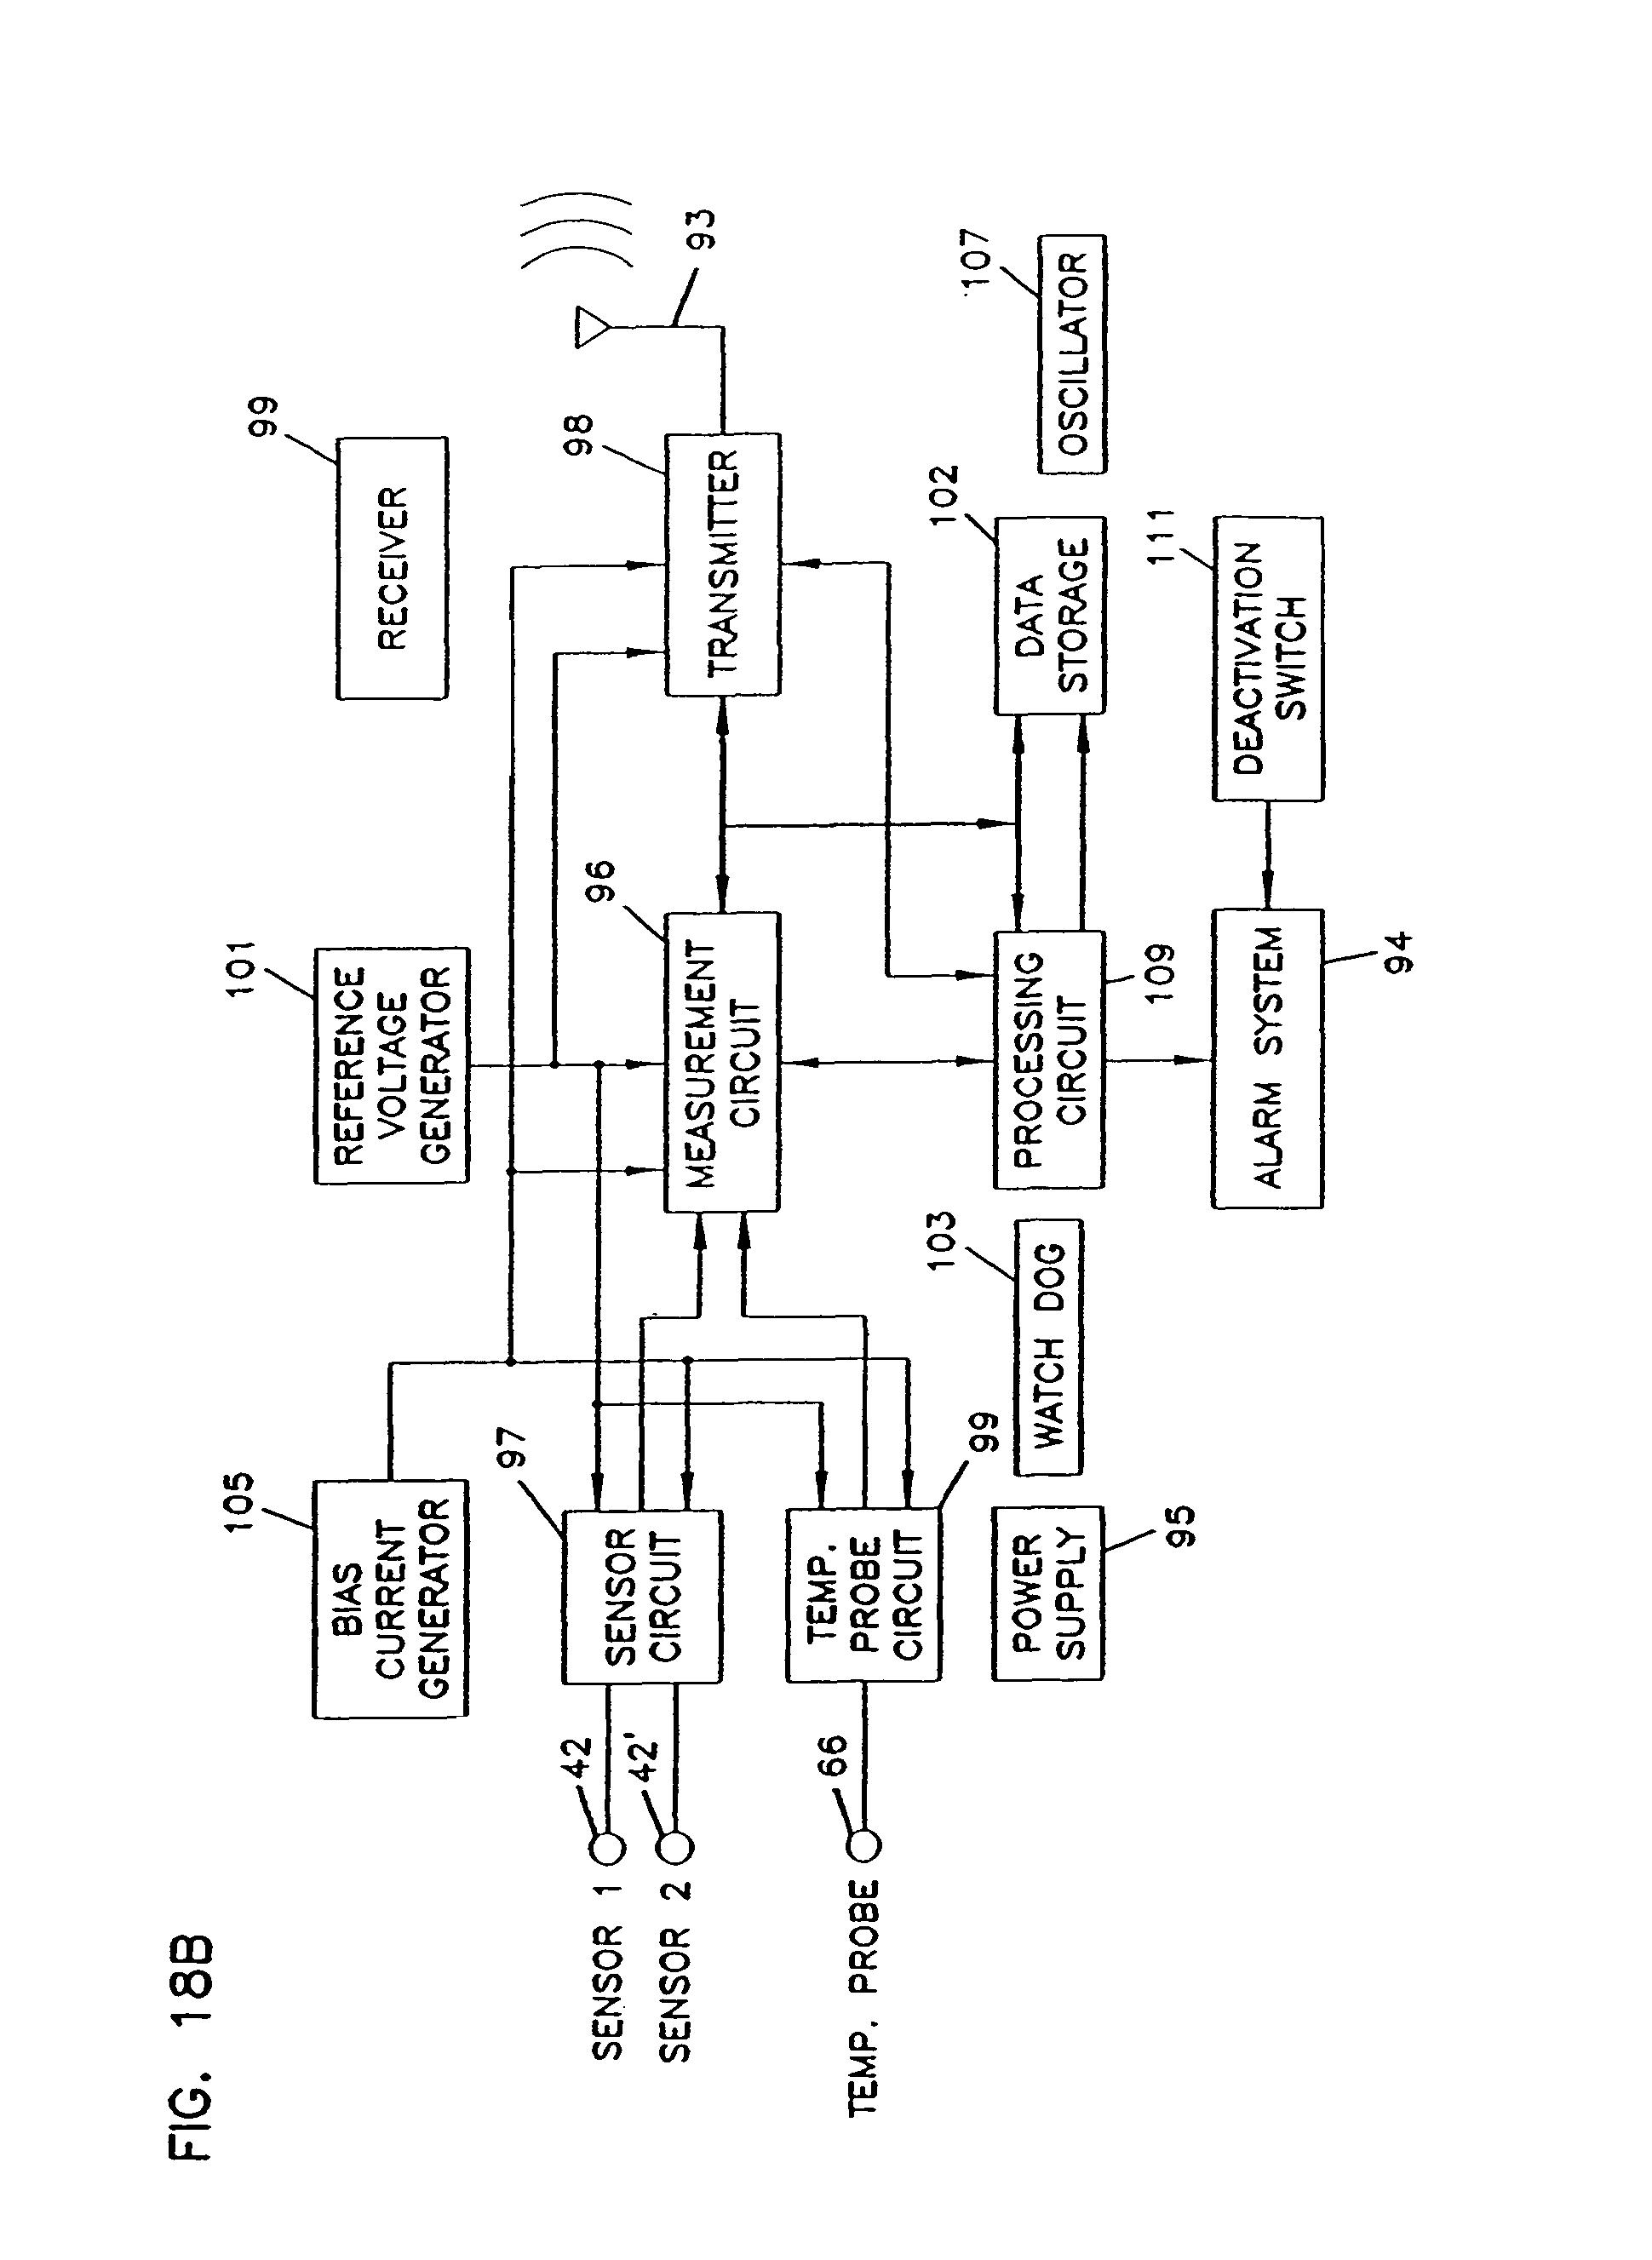 bb markel electric heater wiring diagram    wiring diagram